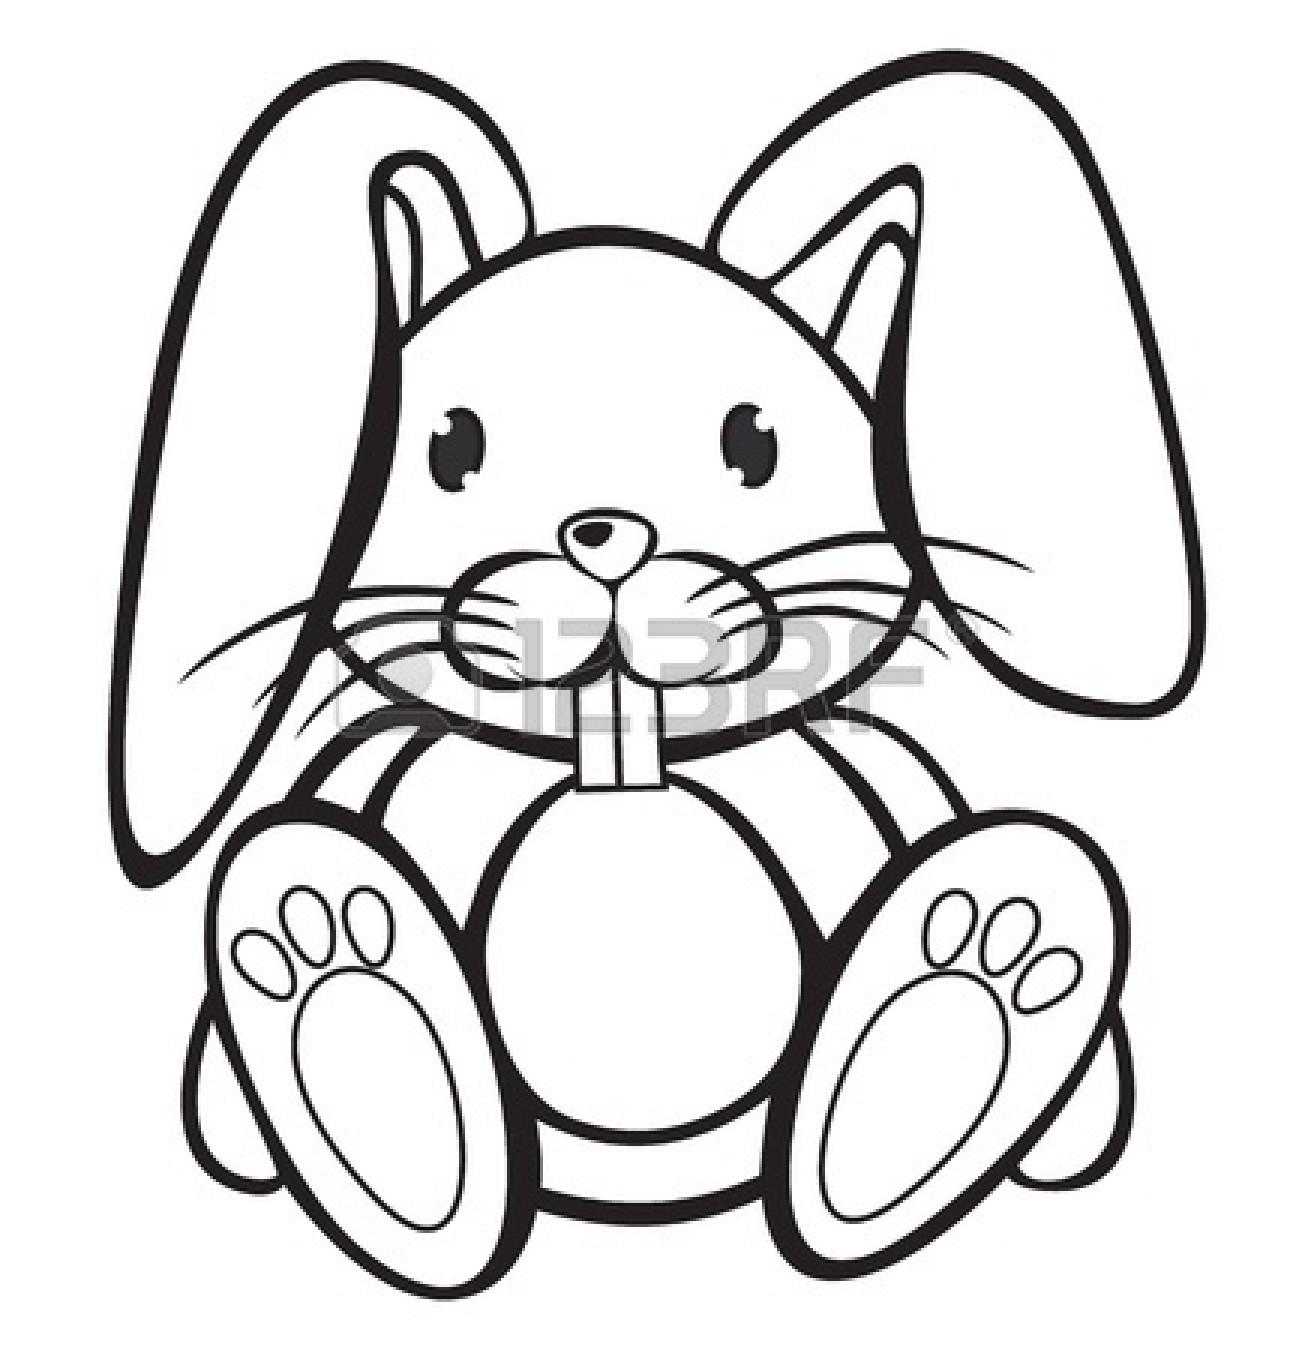 Drawn rabbit cliparts Black clipart collection Rabbit Bunny